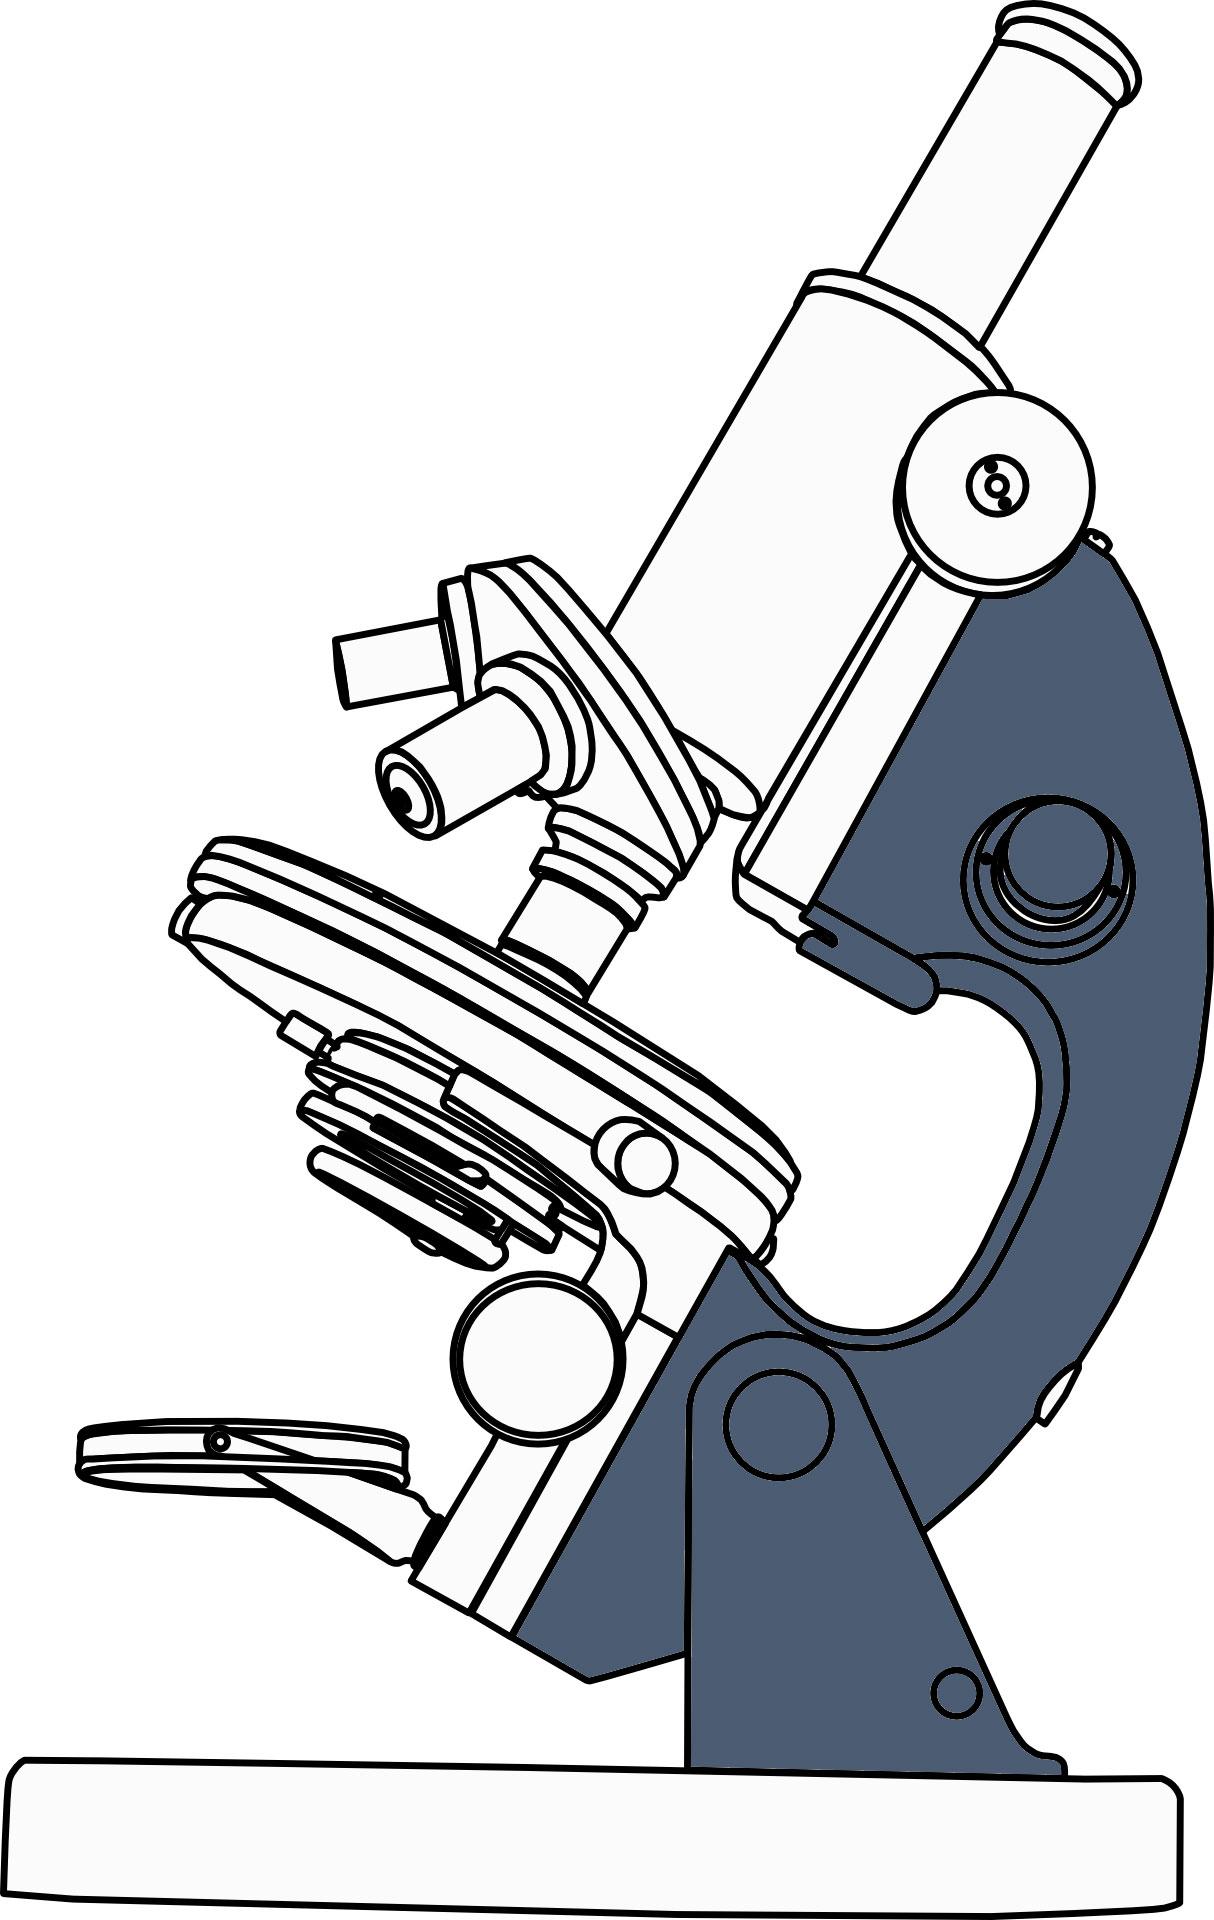 mikroskop stativ mikroskop vergleichen. Black Bedroom Furniture Sets. Home Design Ideas